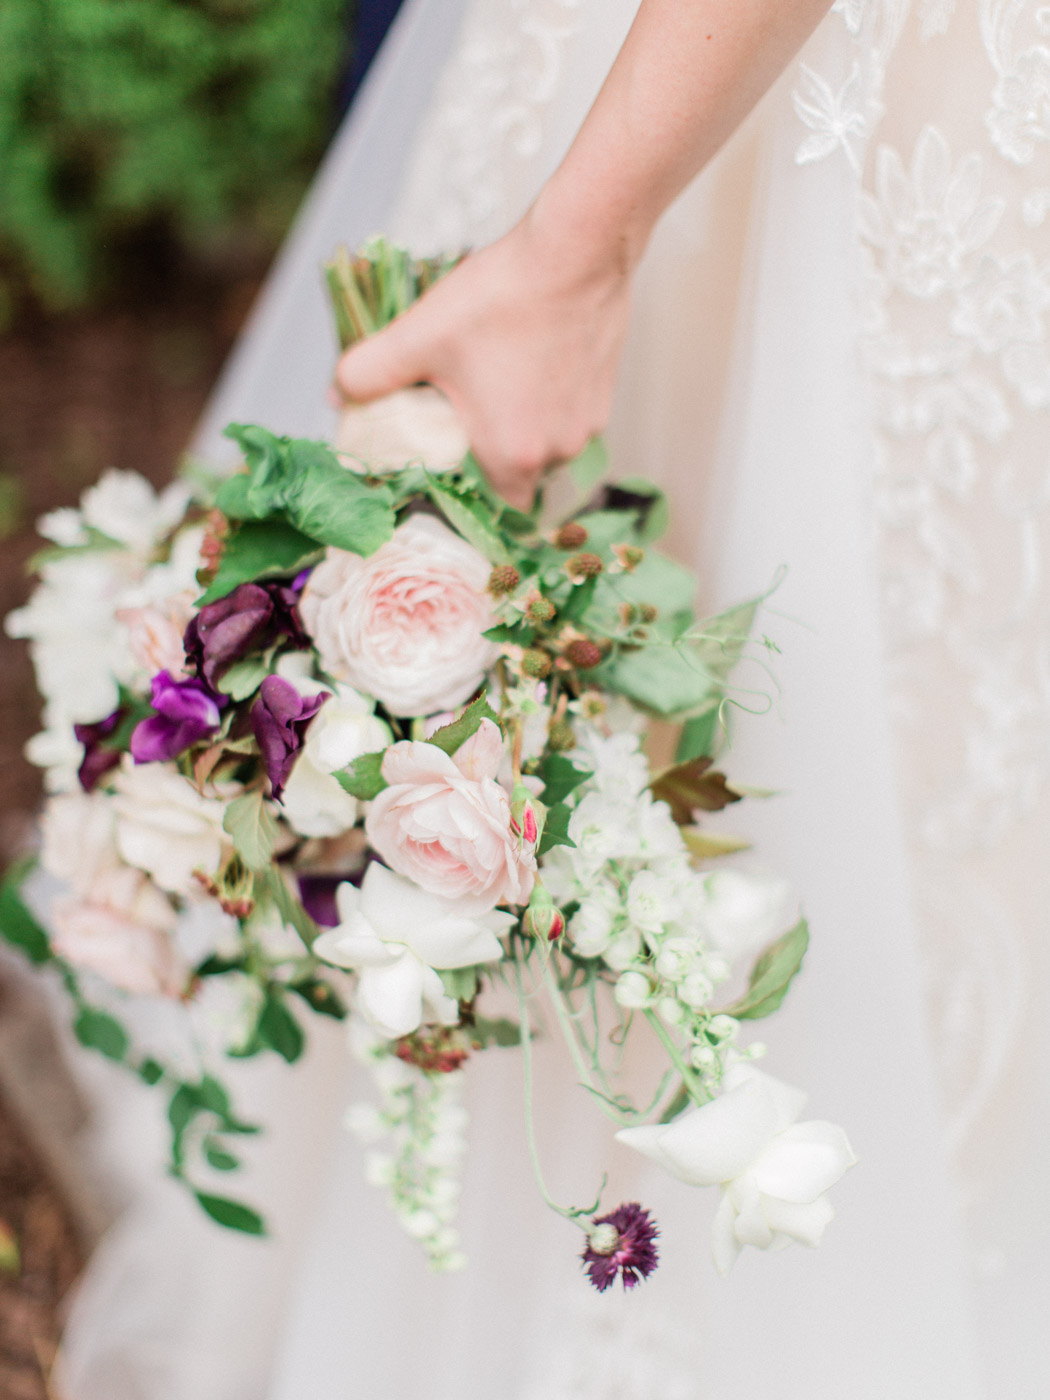 downtown-toronto-wedding-photographer-berkley-fieldhouse-blush-460.jpg